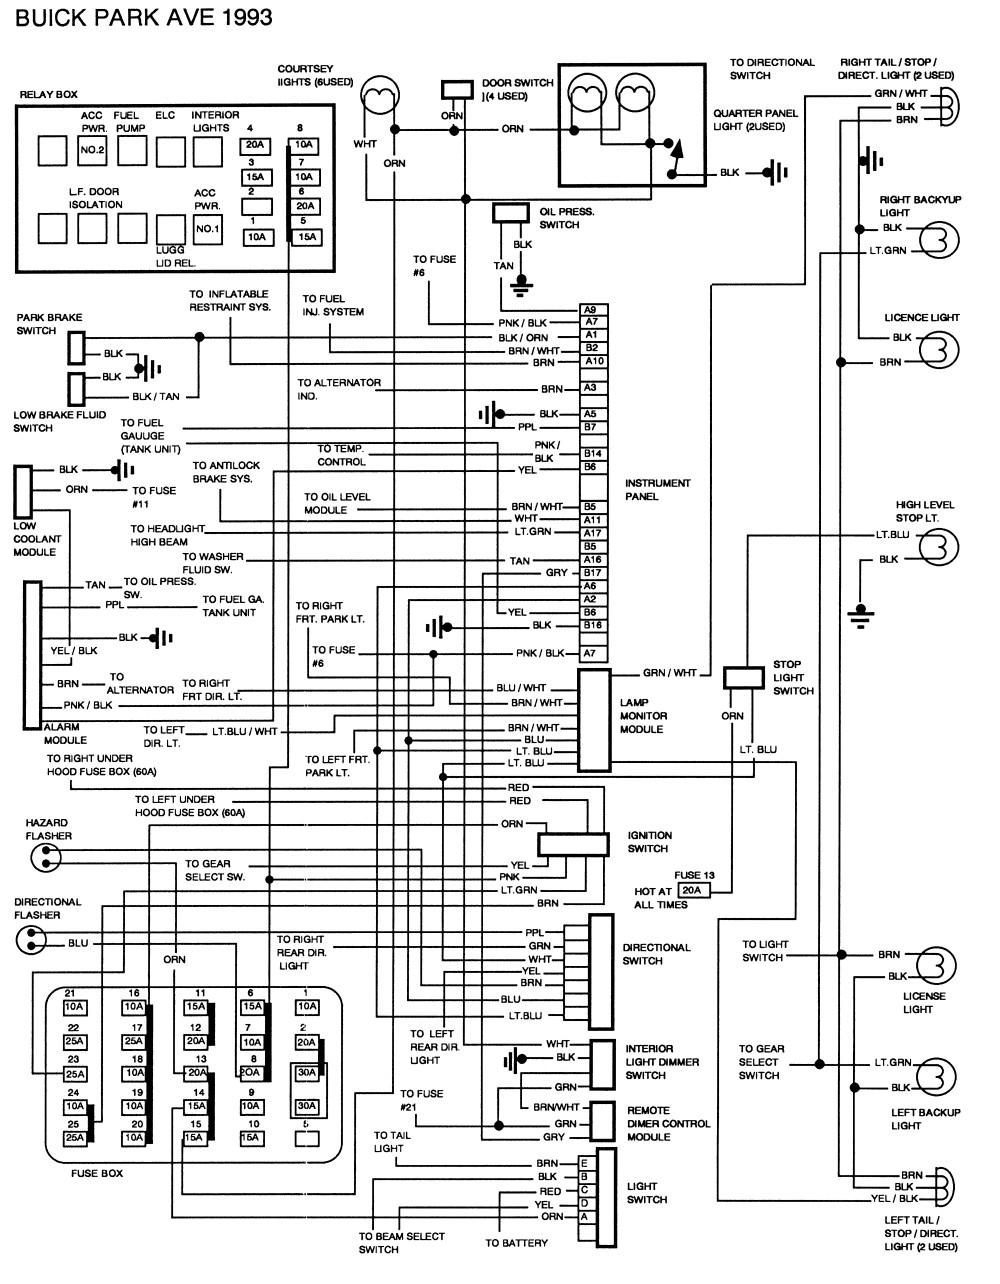 Century Dl1056 Wiring Diagram   Manual e-books on engine diagrams, sincgars radio configurations diagrams, pinout diagrams, switch diagrams, honda motorcycle repair diagrams, led circuit diagrams, gmc fuse box diagrams, hvac diagrams, electrical diagrams, electronic circuit diagrams, internet of things diagrams, lighting diagrams, snatch block diagrams, battery diagrams, series and parallel circuits diagrams, friendship bracelet diagrams, motor diagrams, transformer diagrams, smart car diagrams, troubleshooting diagrams,